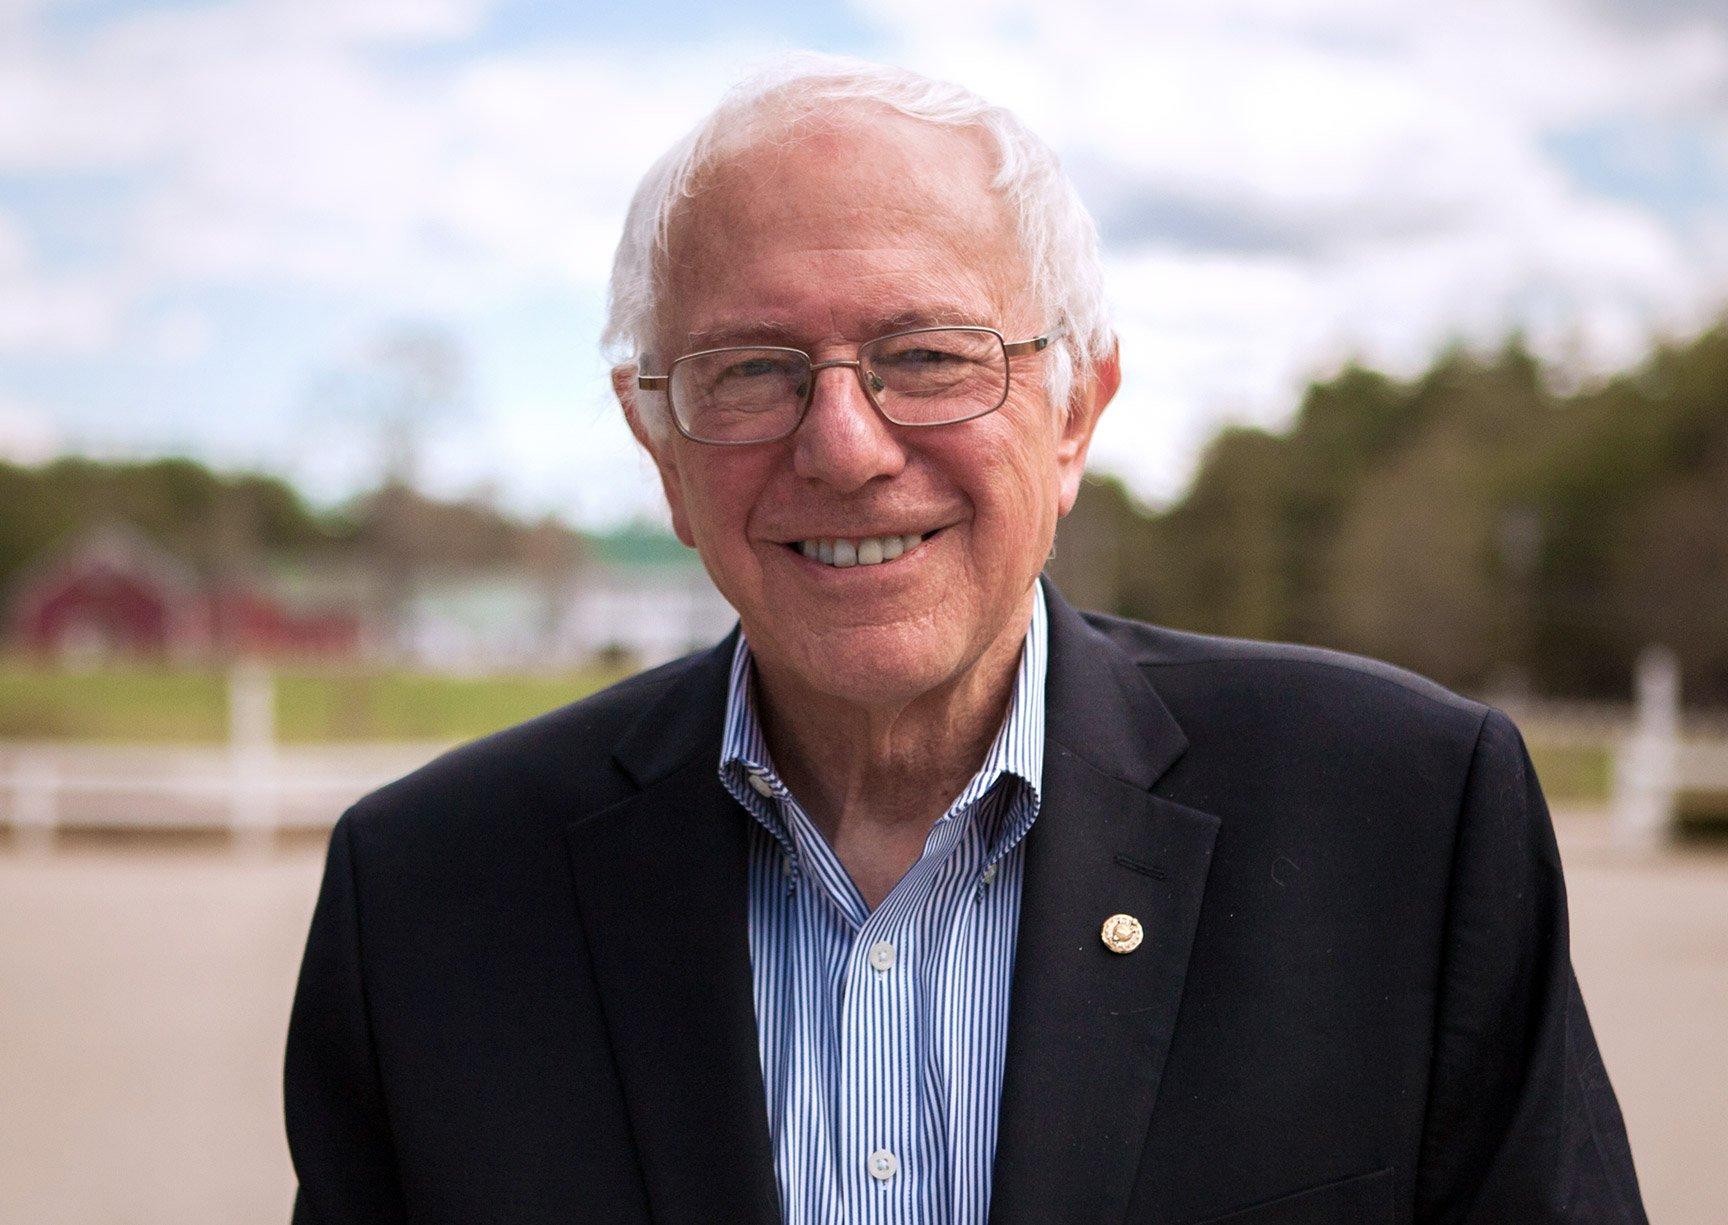 2020 Senator Bernie Sanders